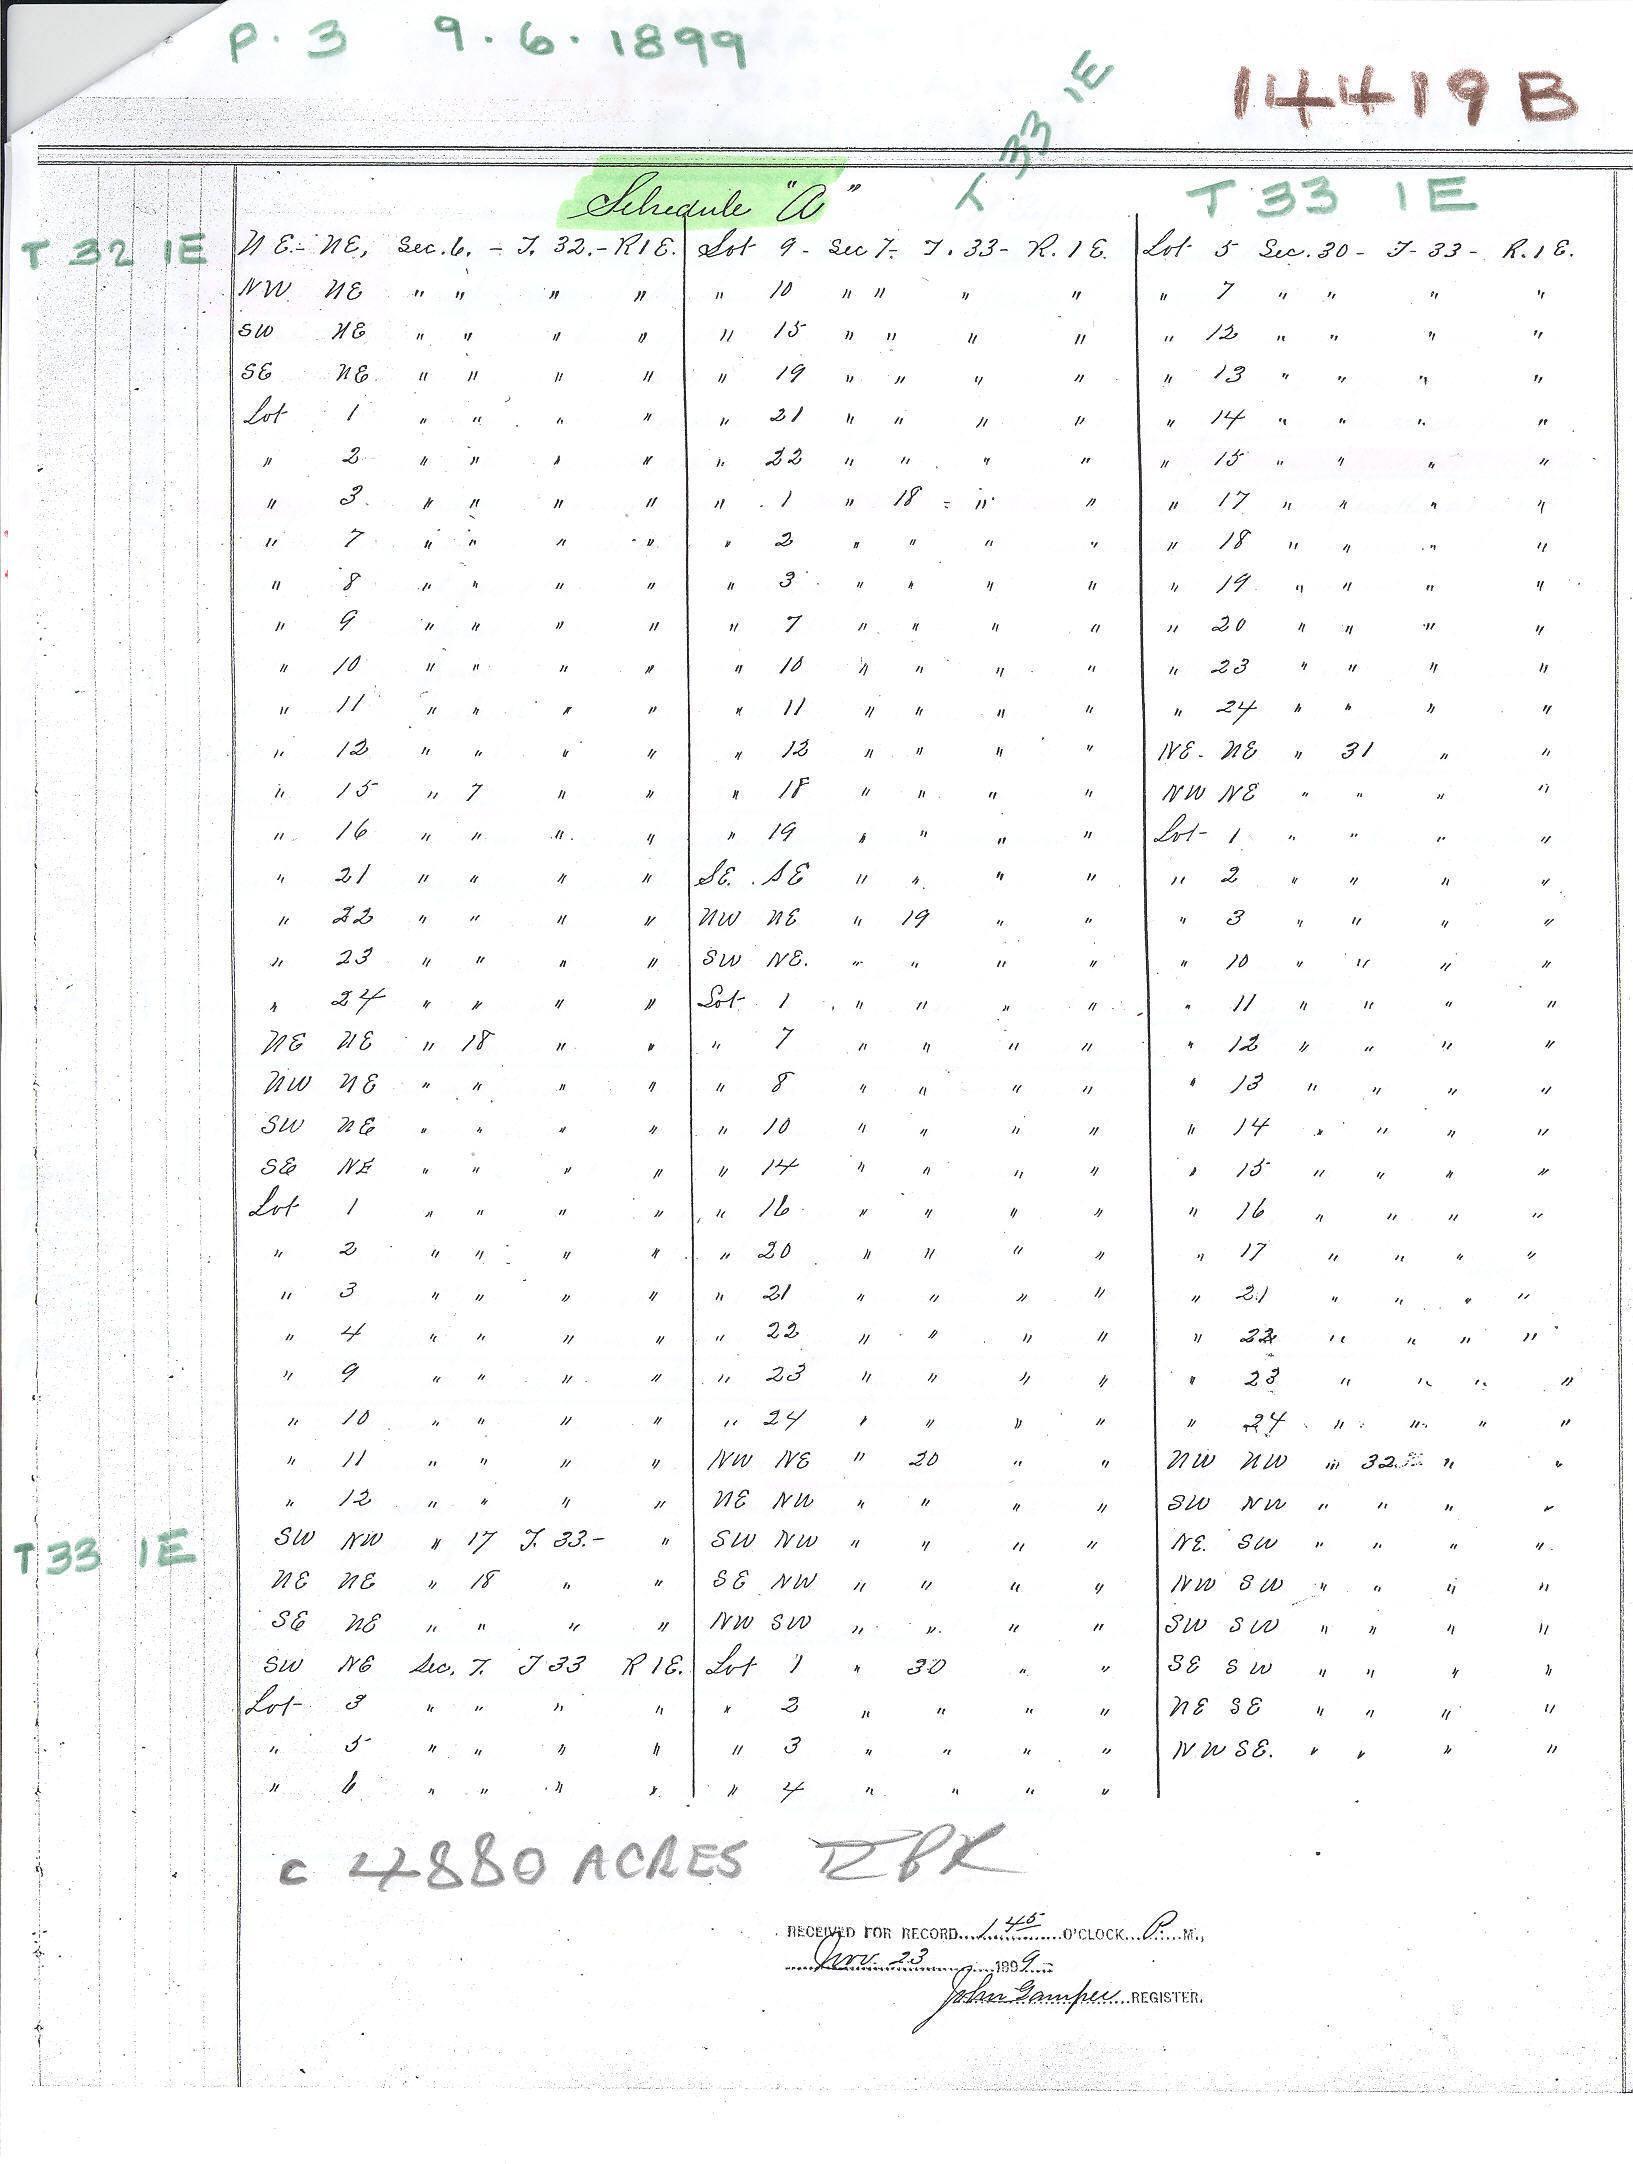 C:\Users\Robert P. Rusch\Desktop\II. RLHSoc\Documents & Photos-Scanned\Rib Lake History 14400-14499\14419B-legal descriptions of land affected.jpg